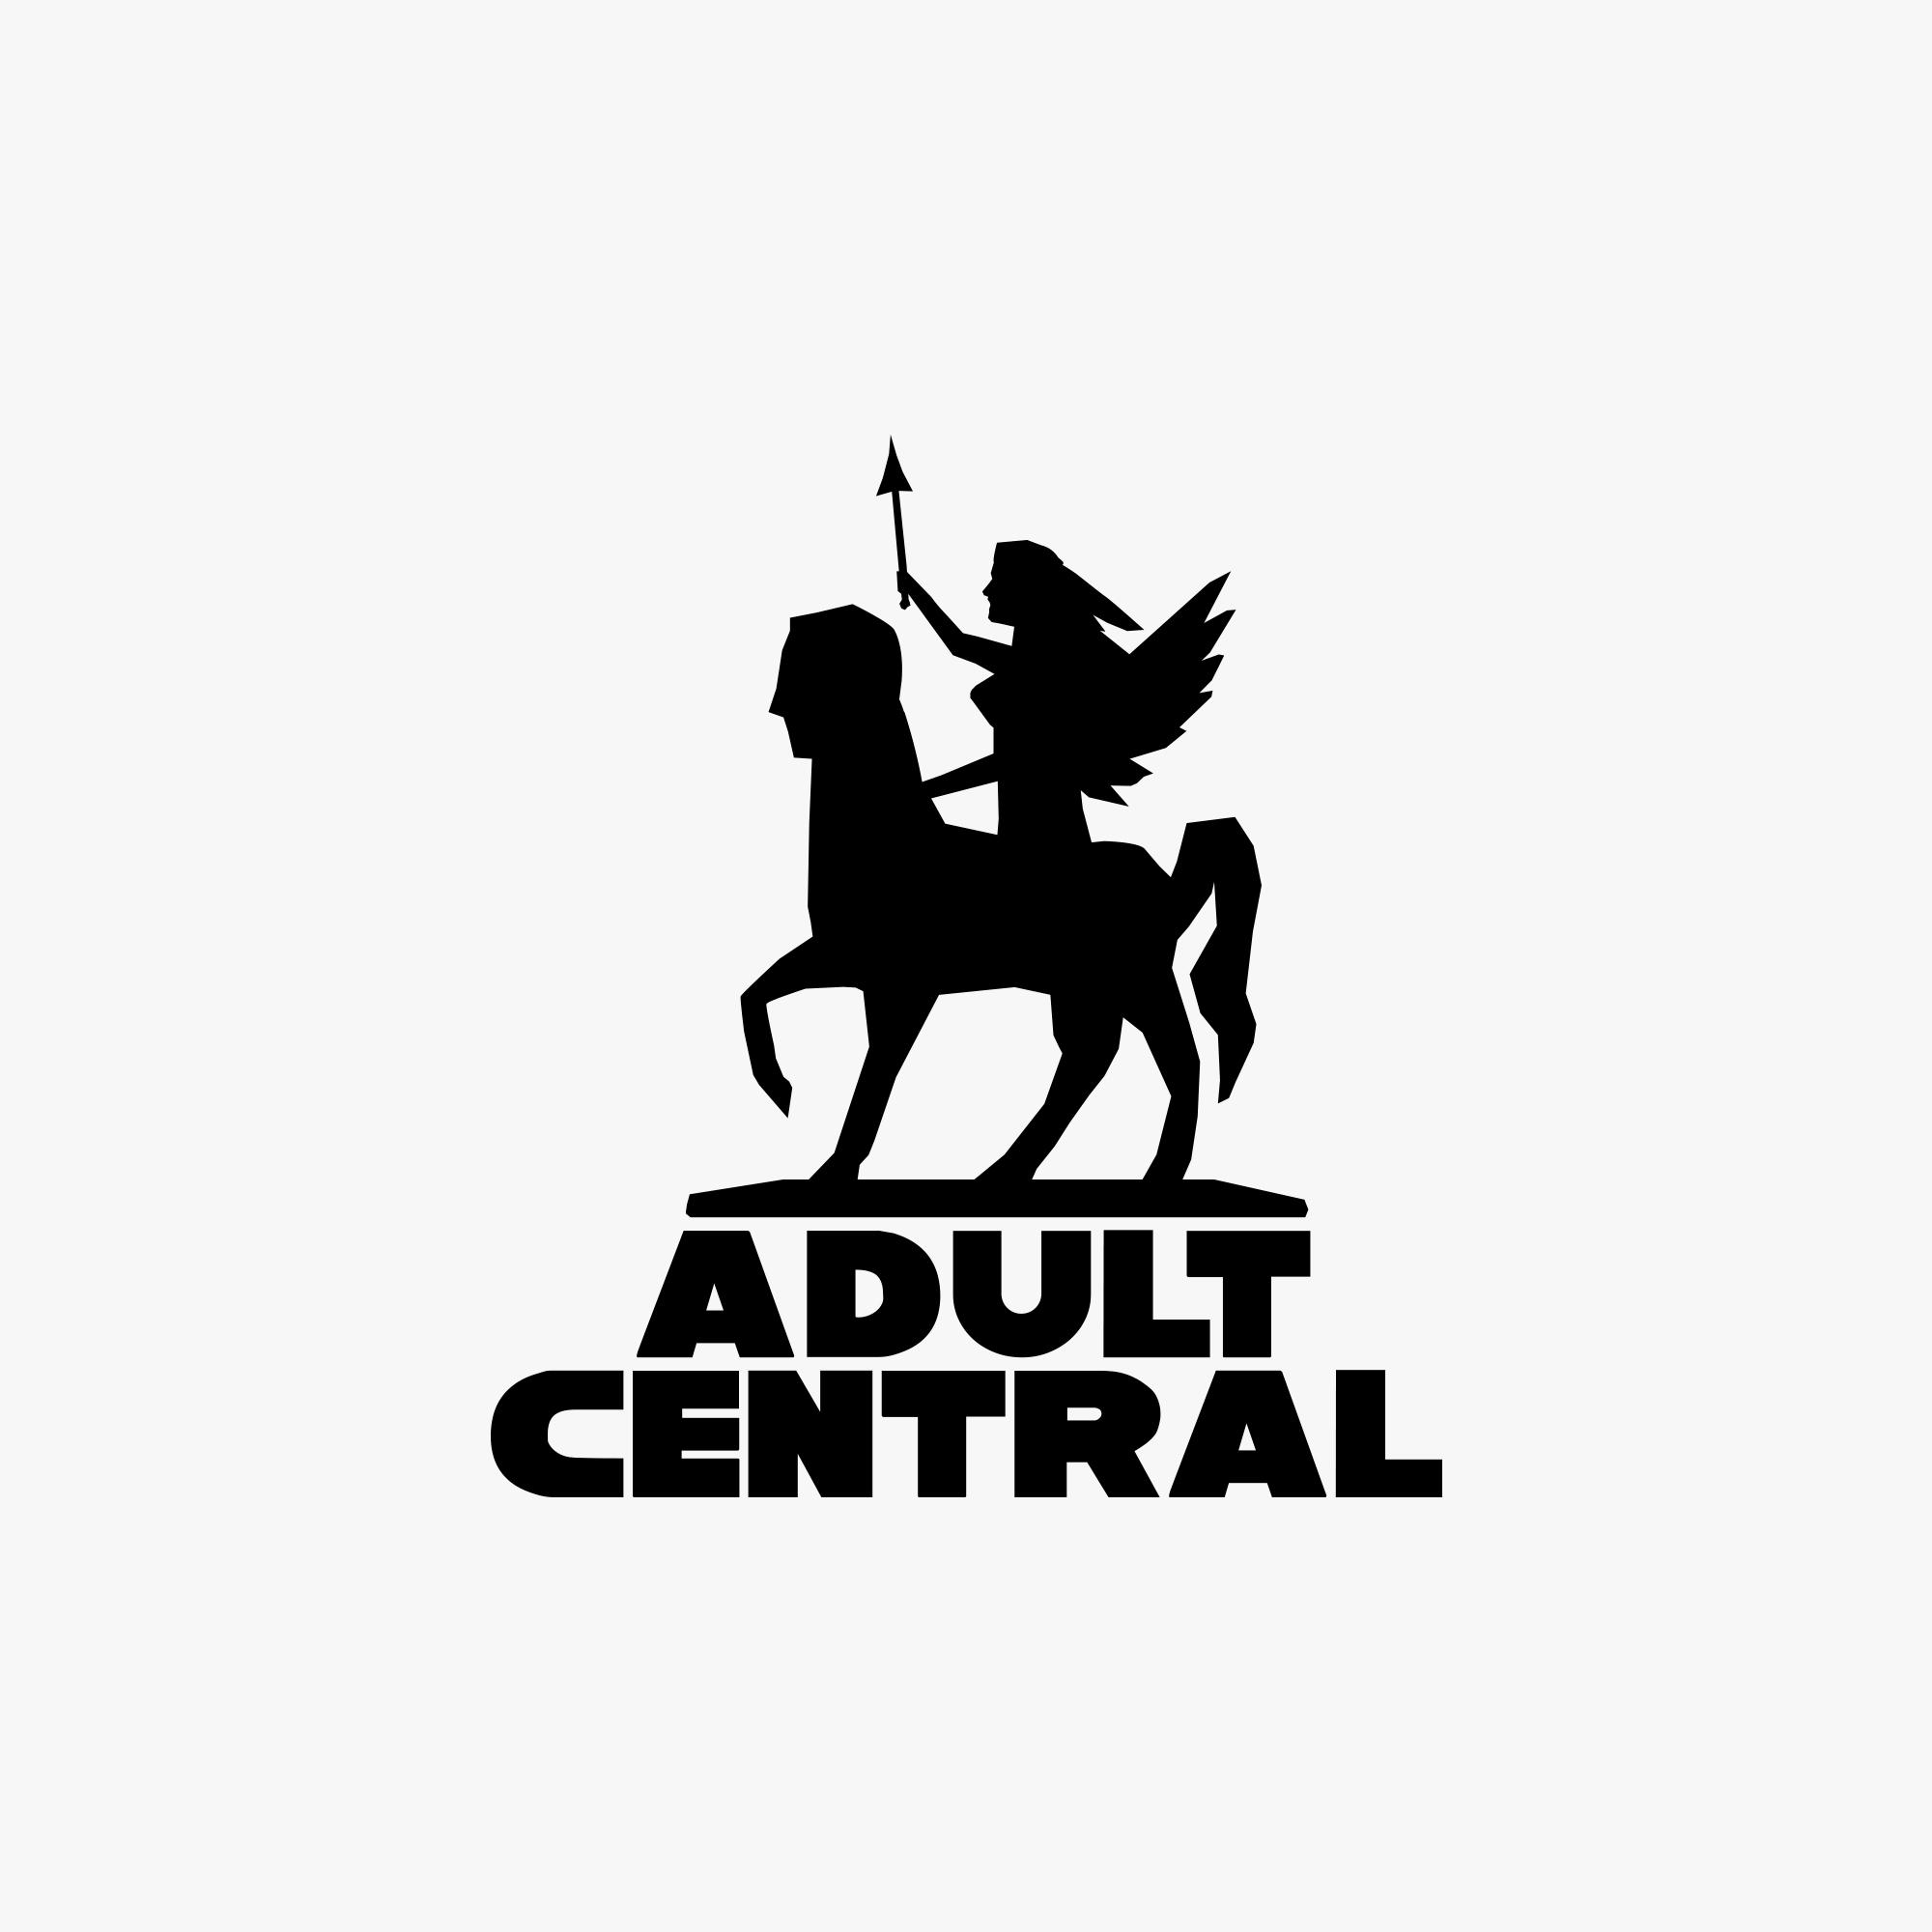 pauldersidan_adultcentral_logo_1.jpg